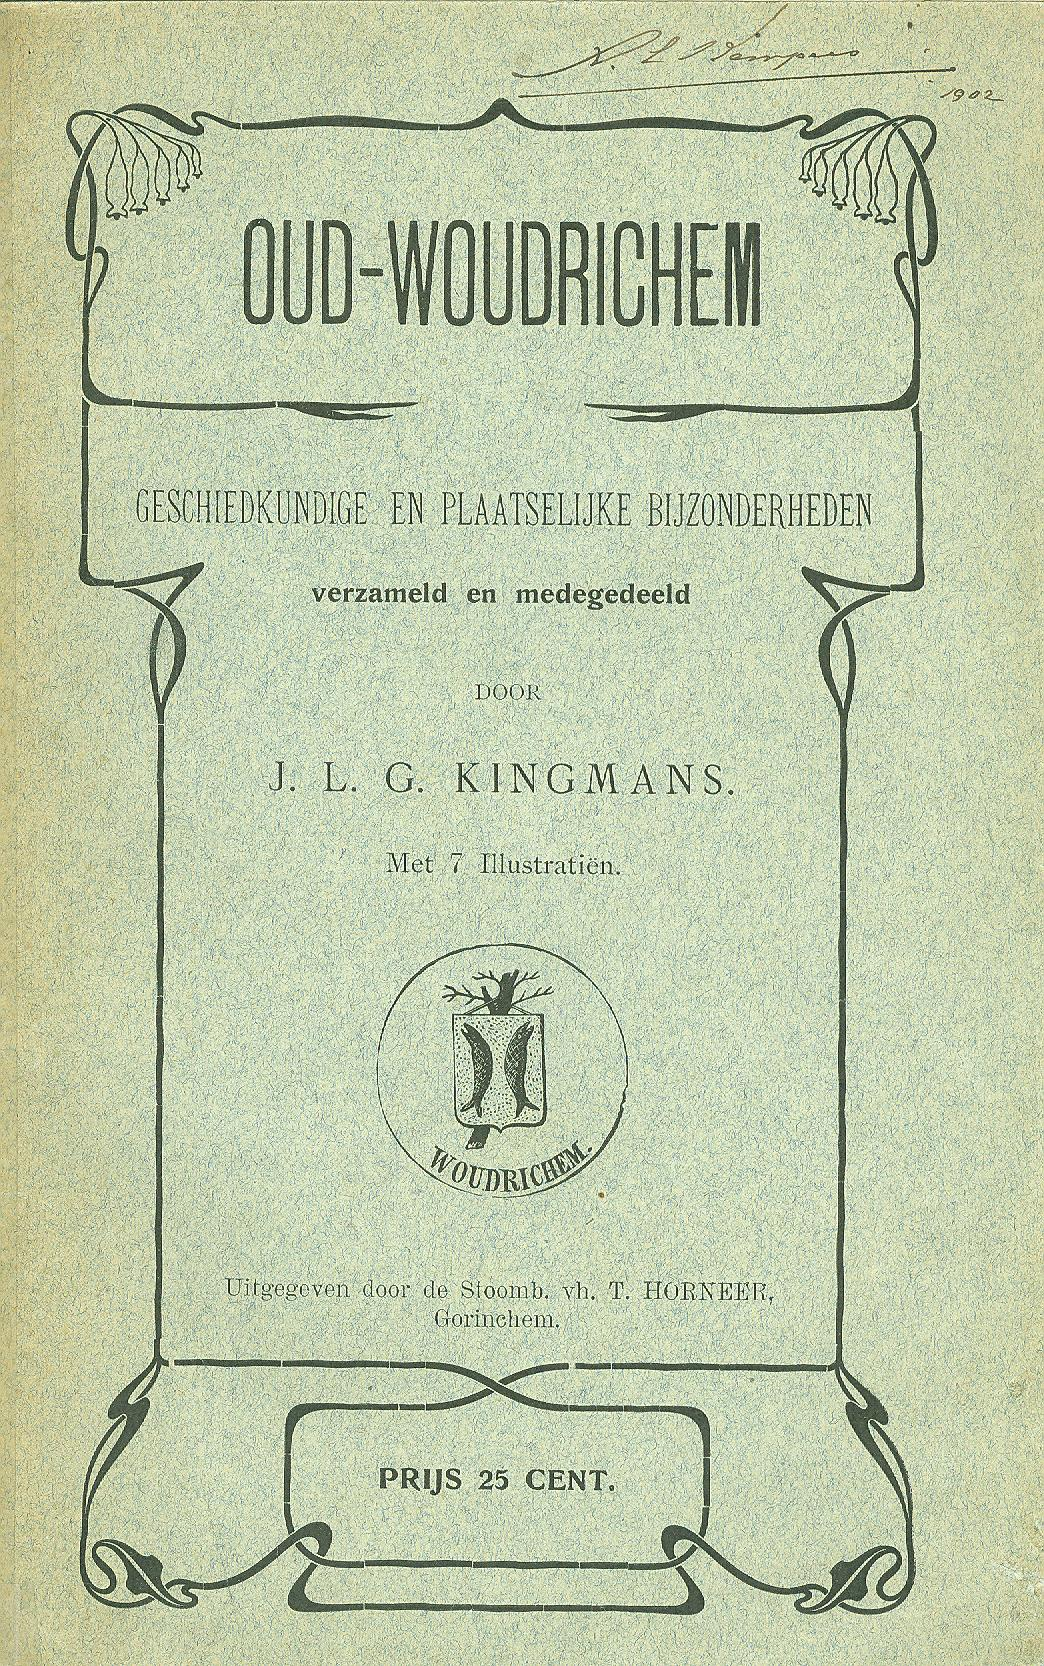 011 Oud Woudrichem 2a